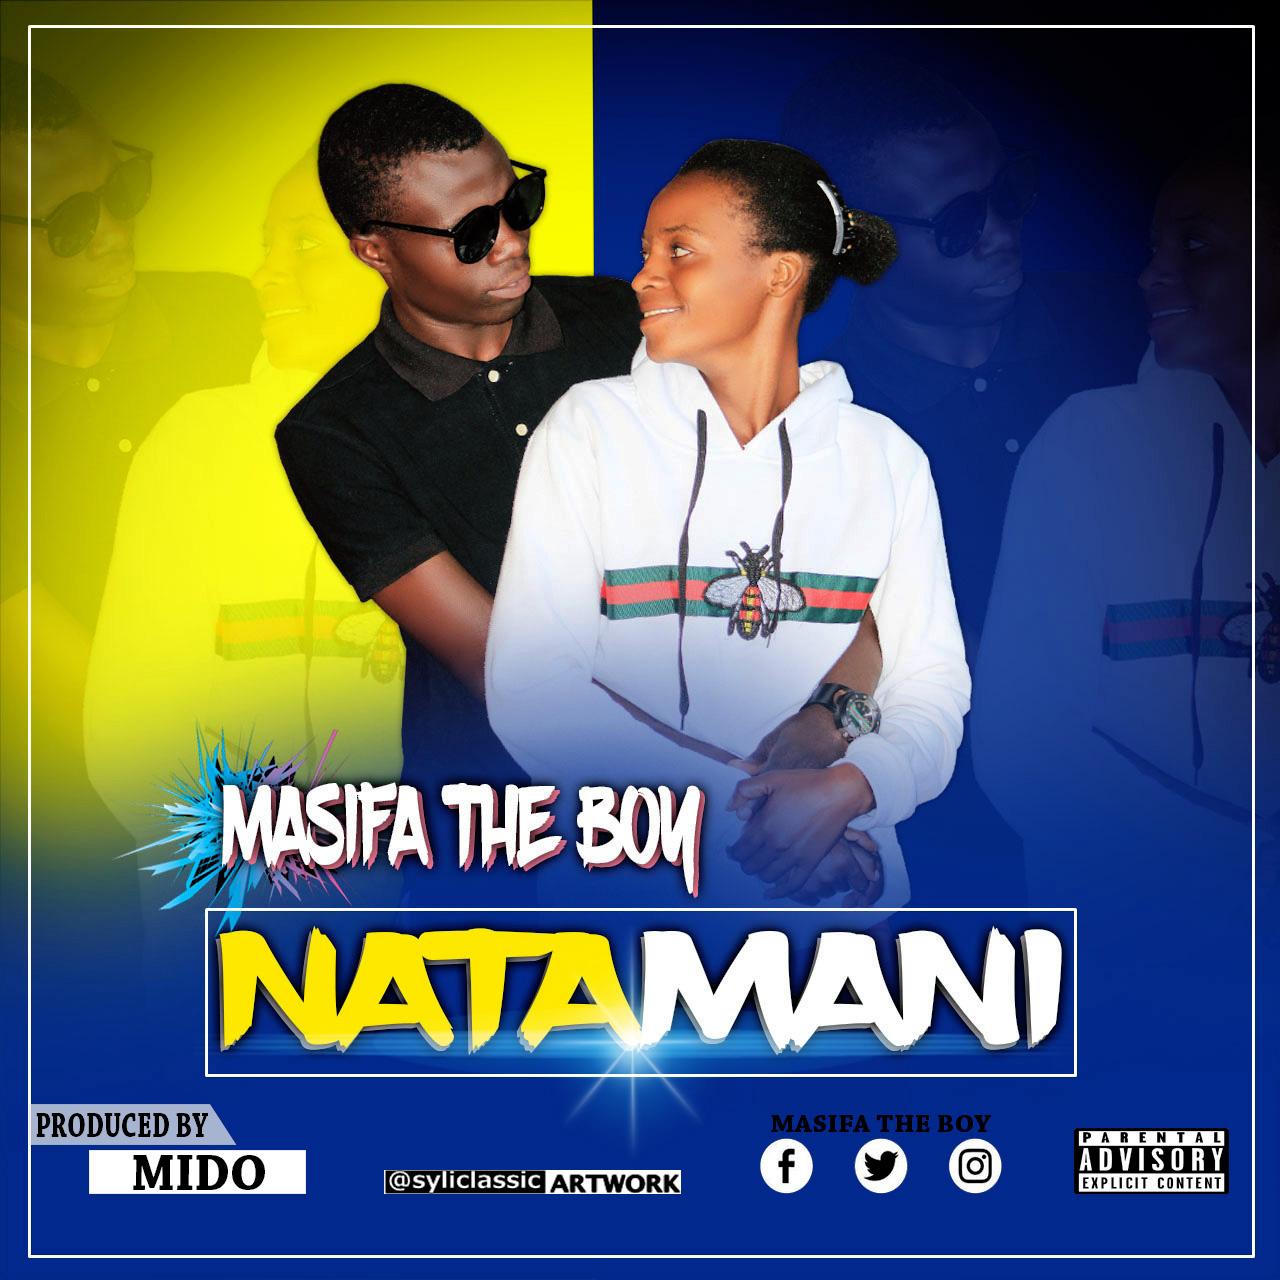 Masifa The Boy - Natamani